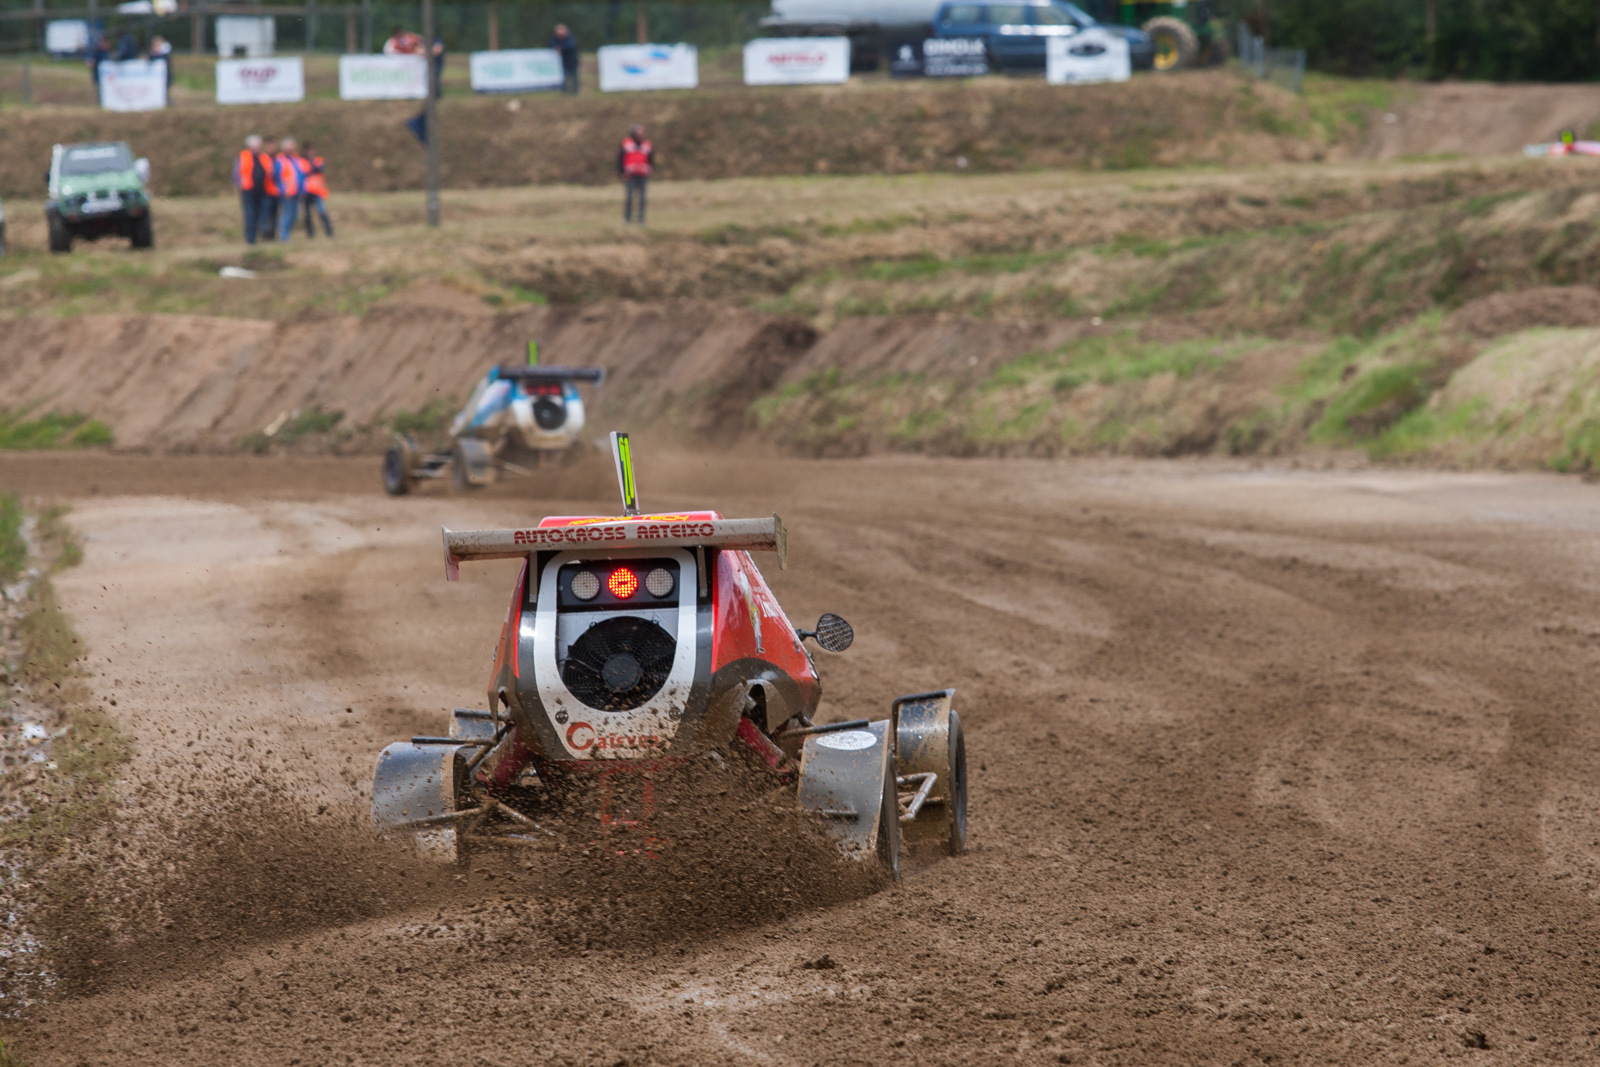 005 Autocross Carballo FGA 2016 017